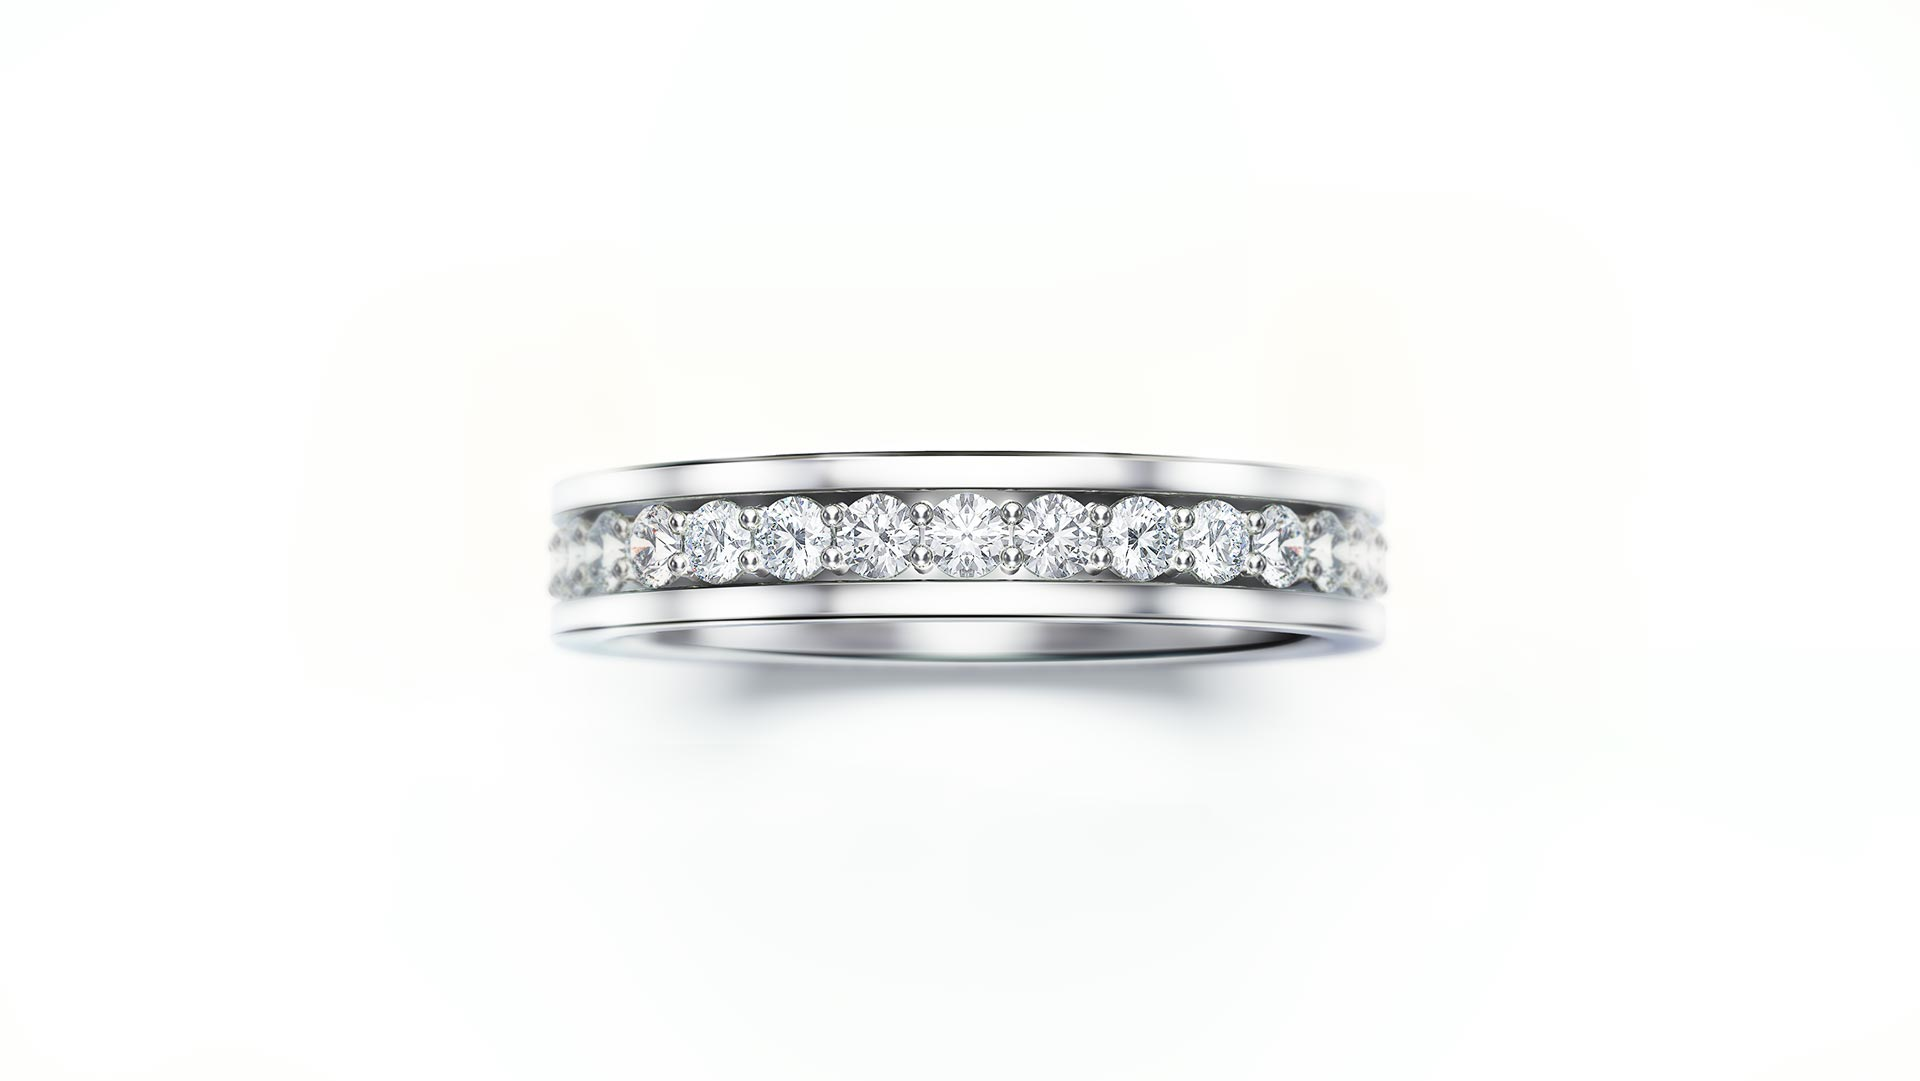 Diamond Ring Jewellery Render